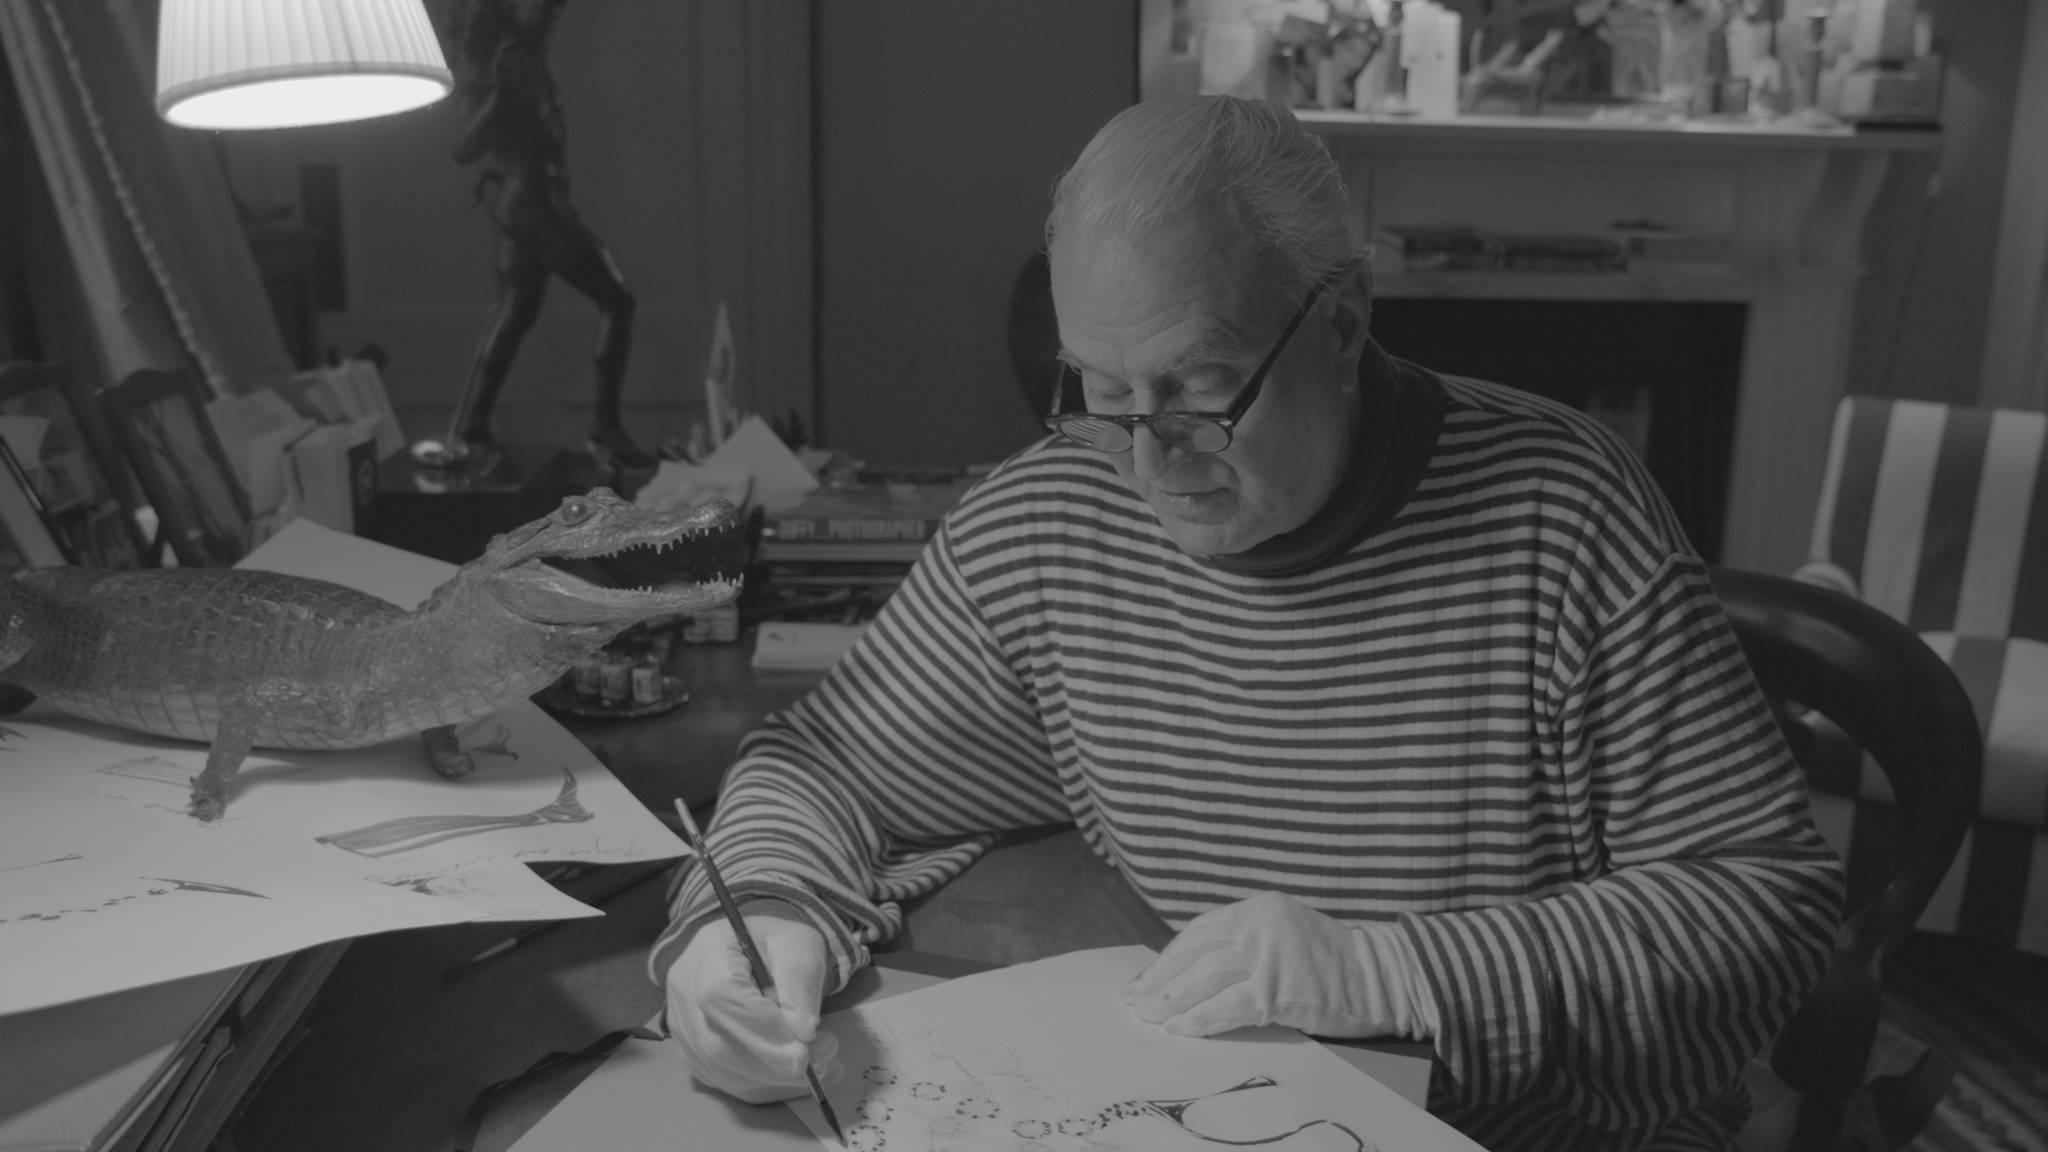 Designer de sapatos Manolo Blahnik